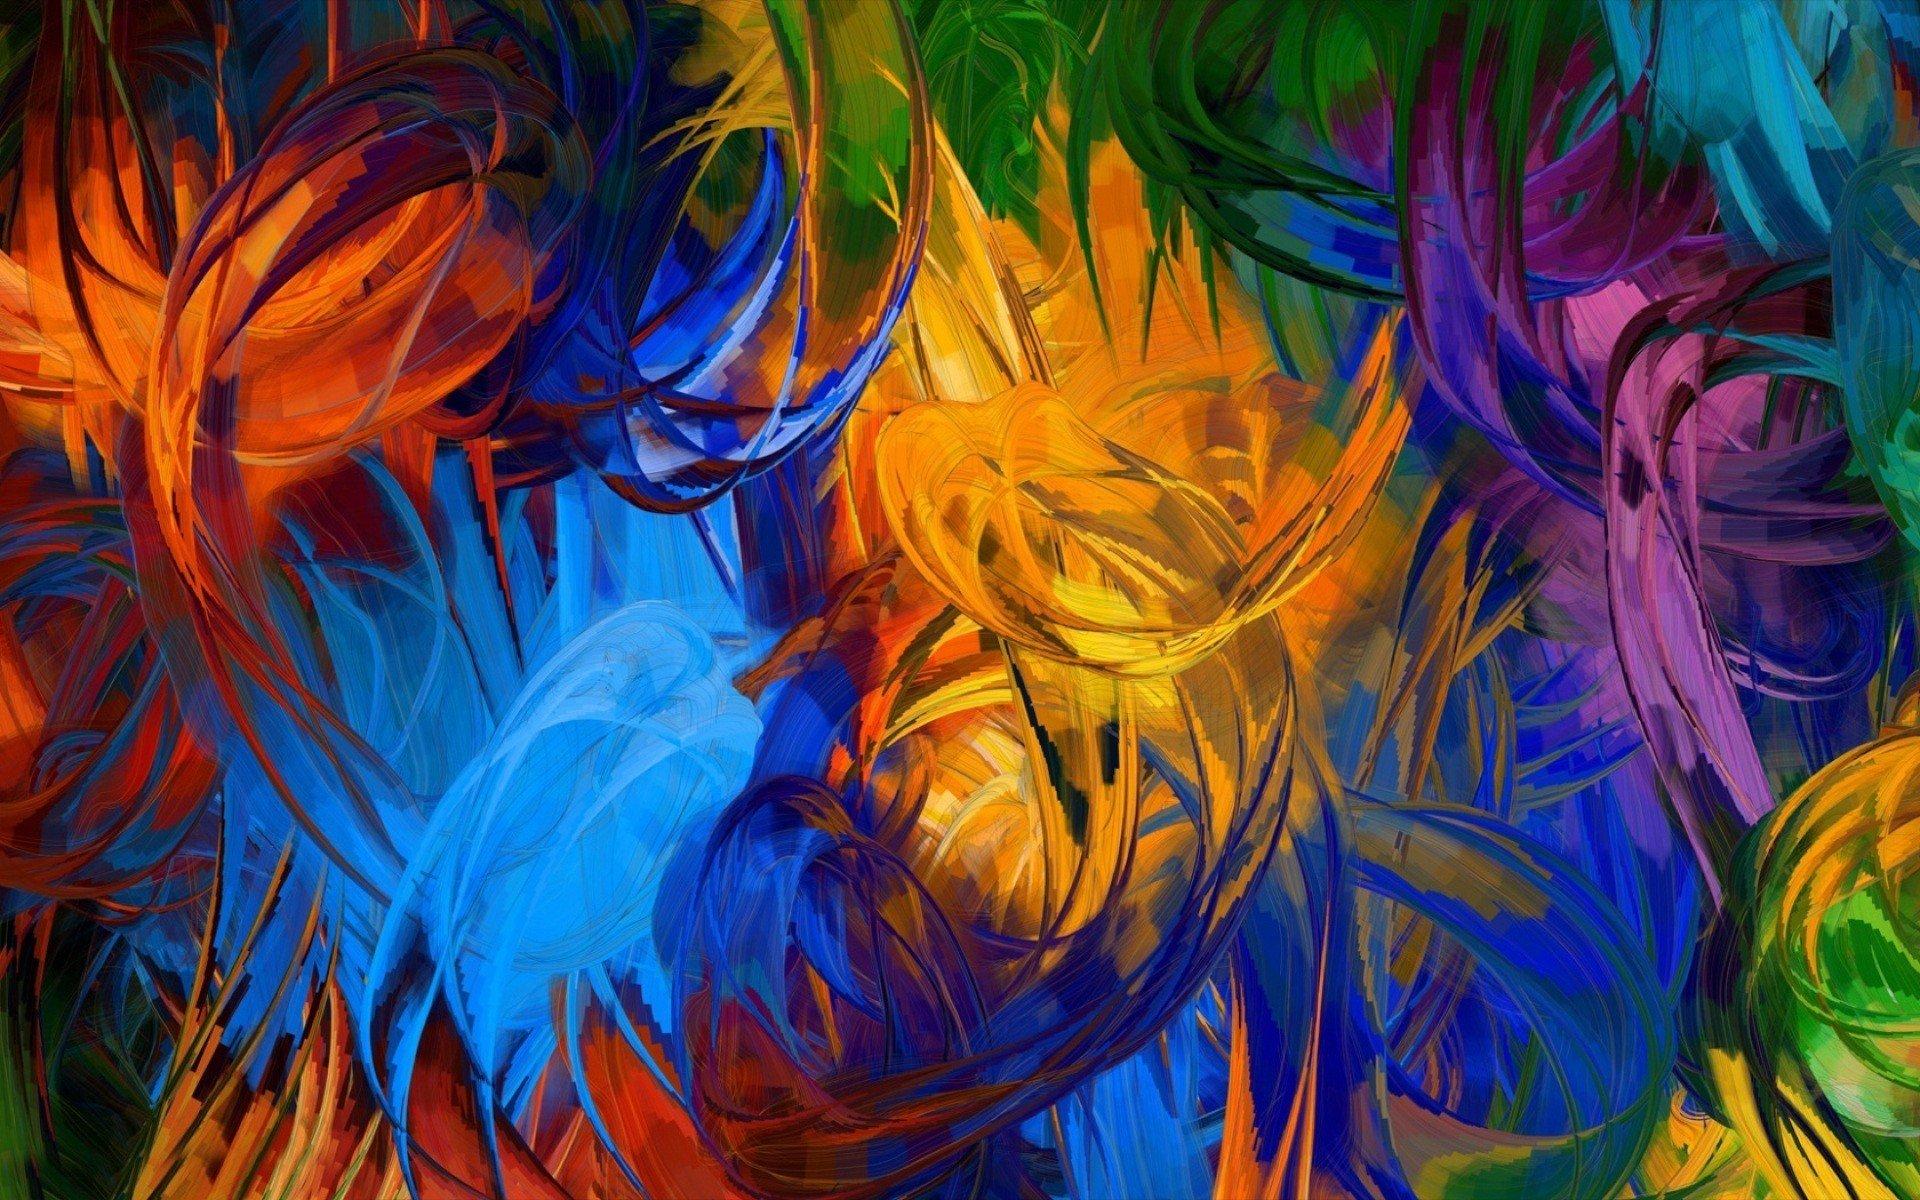 Abstract Art Drawing Paint Wallpaper Desktop Wallpaper with 1920x1200 1920x1200